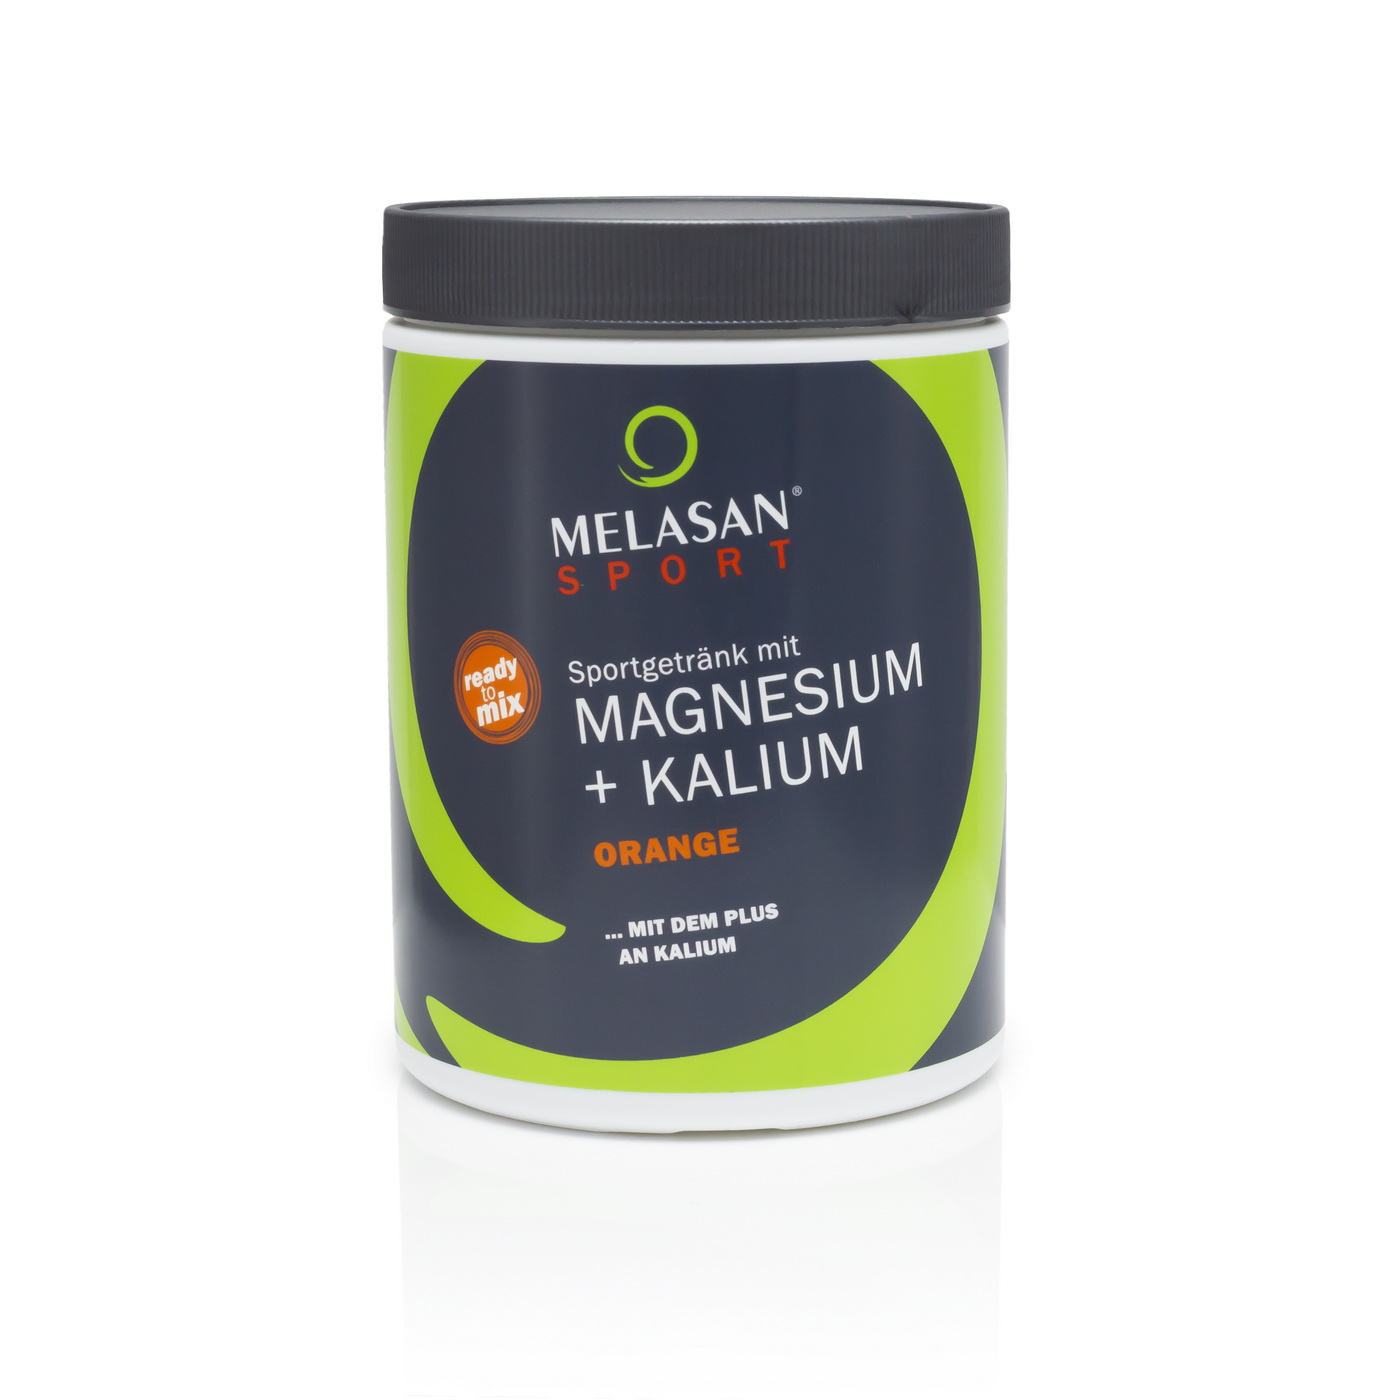 Melasan Sportgetränk Magnesium-Kalium ORANGE